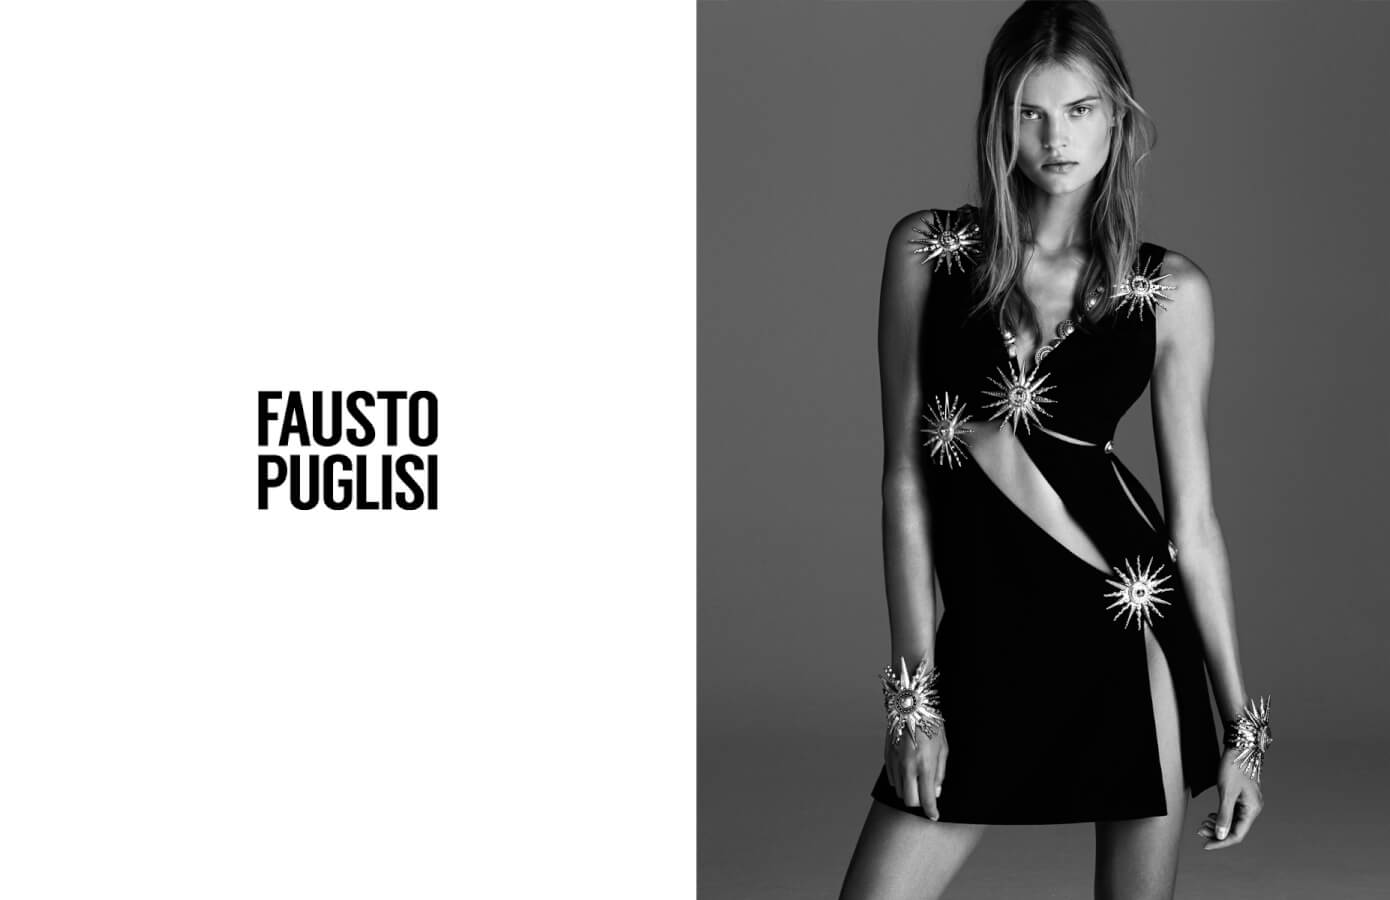 01_Alvaro_Beamud_Cortes_Fausto Puglisi_SS15